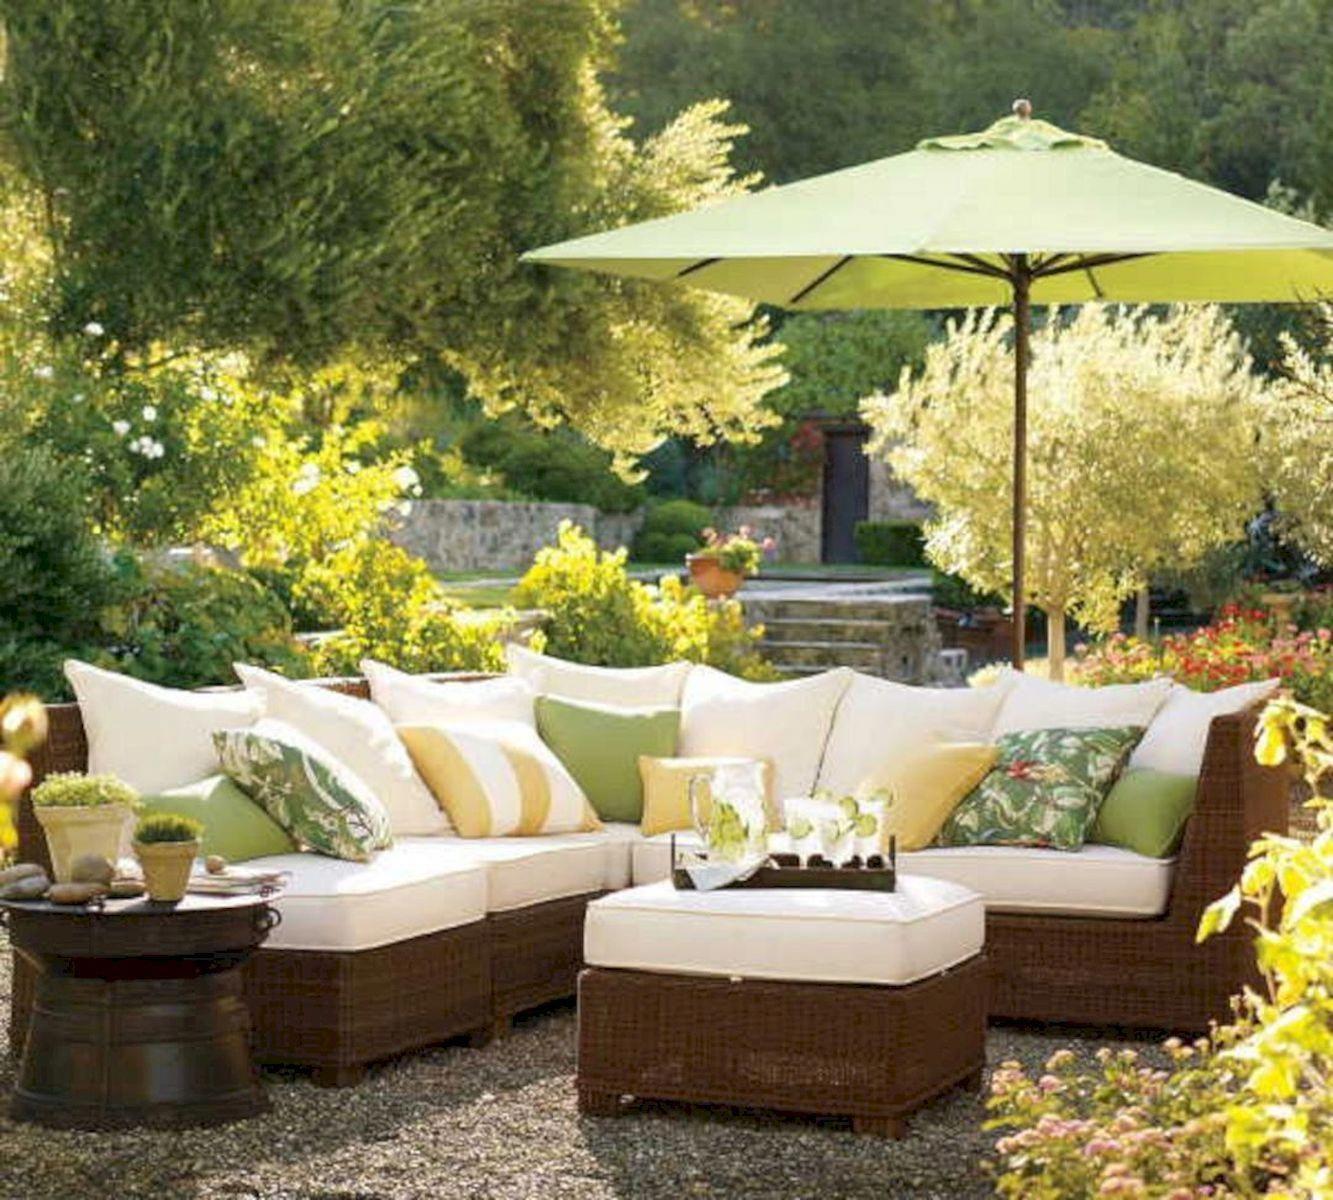 Backyard Ideas Cute Yard Suggestion Number 8403543025 Creative